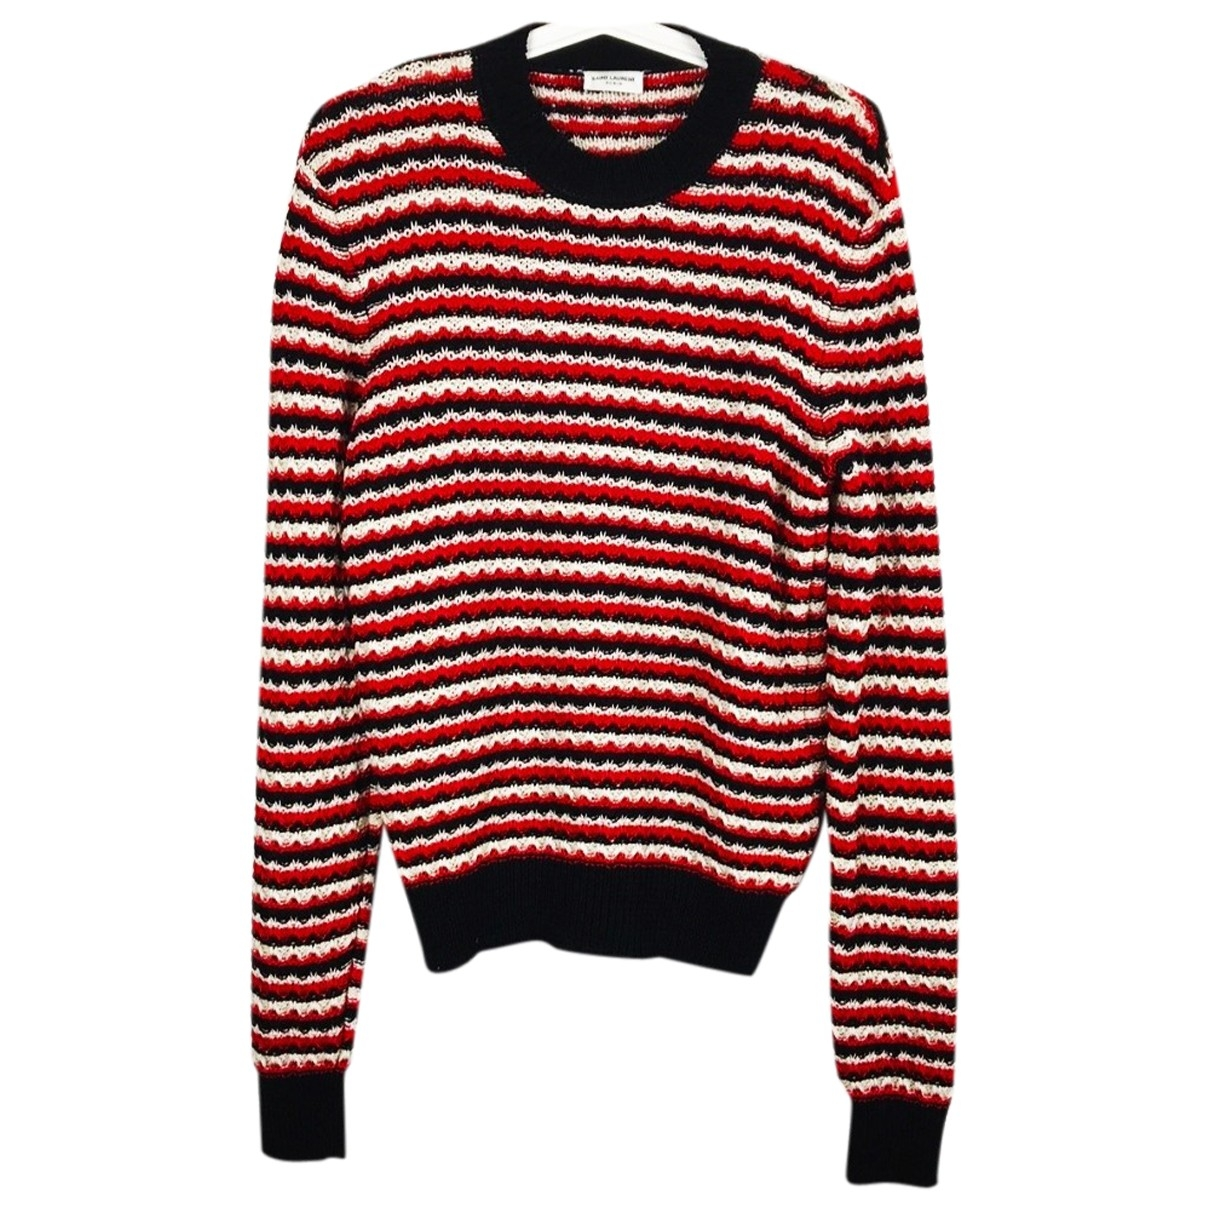 Saint Laurent \N Cotton Knitwear for Women S International